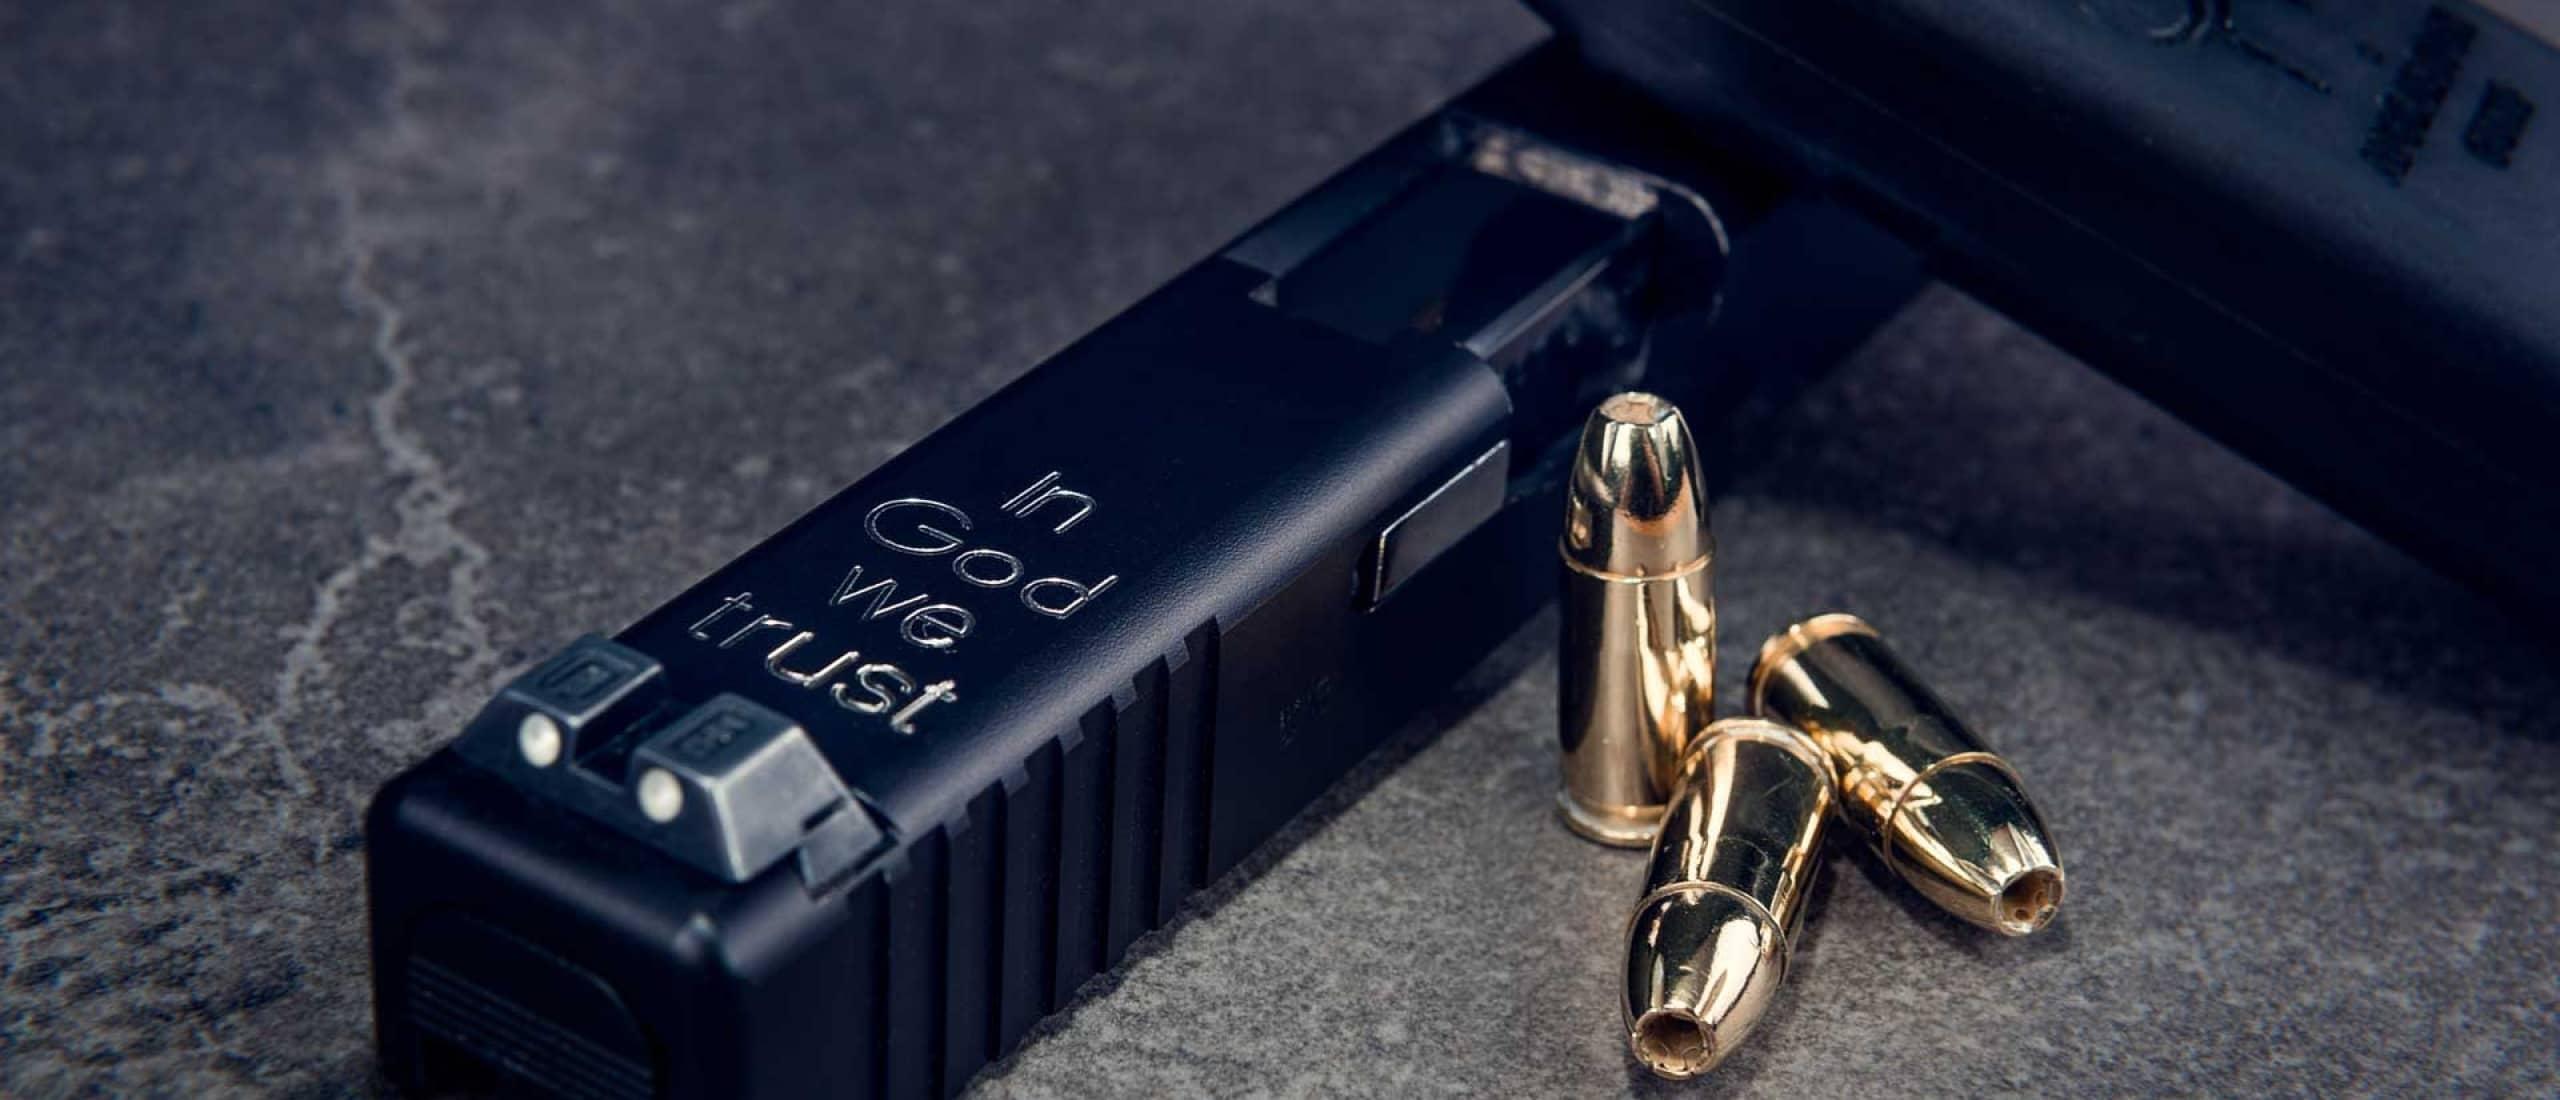 verex-tactical-tuning-waffen-pistole-glock-sig-sauer-17-cz-walther-visier-bruenieren-ar15-red-dot-beschichtung-tuning-cerakote-stippling-griptech-salzburg-14